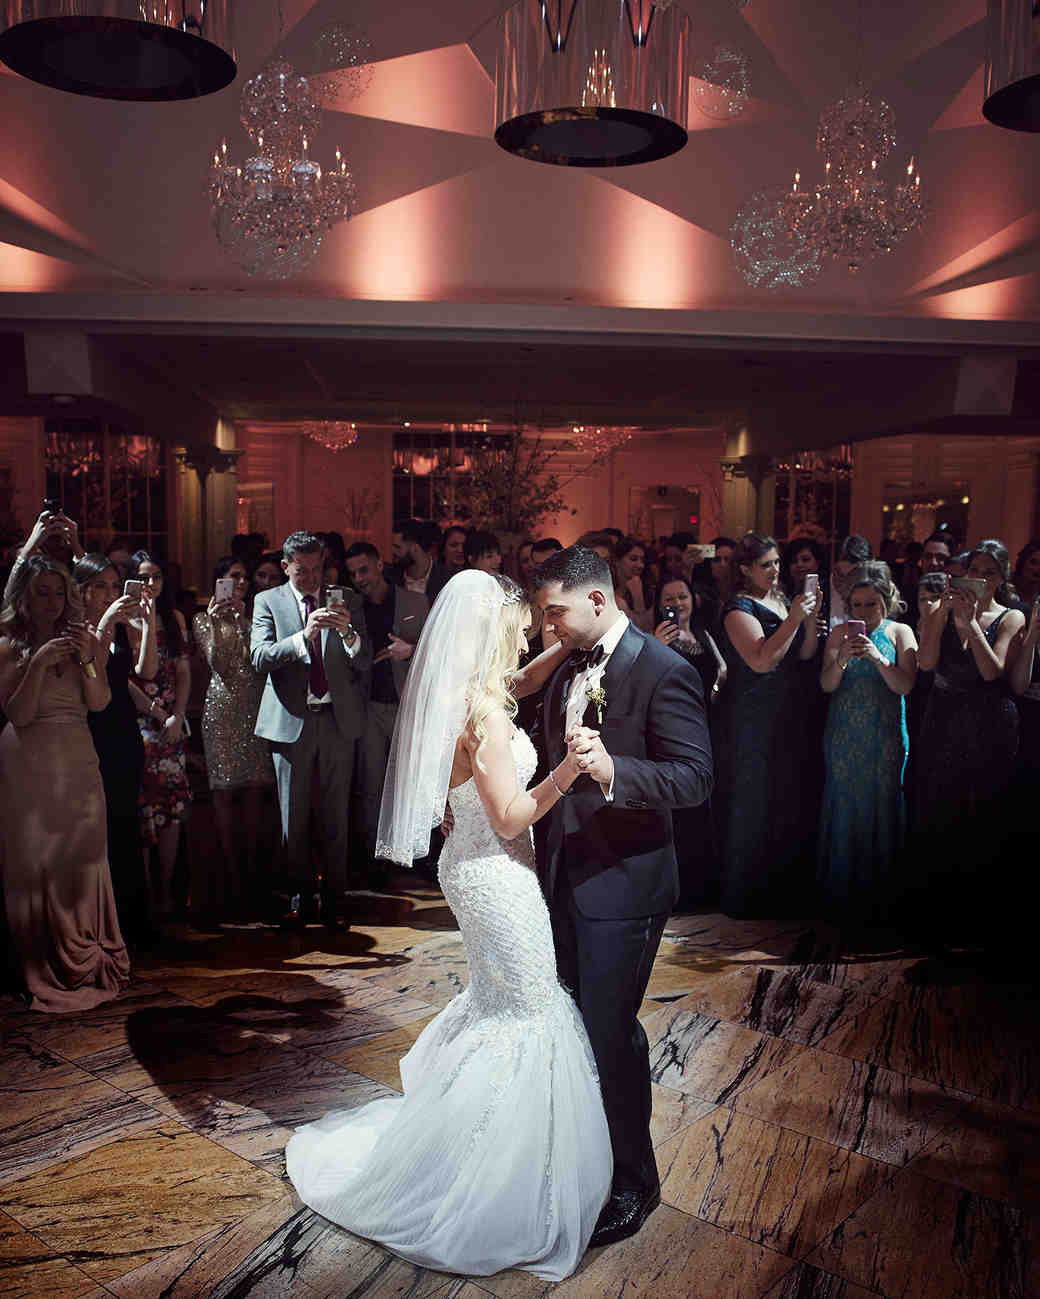 shqipe zenel wedding couple first dance